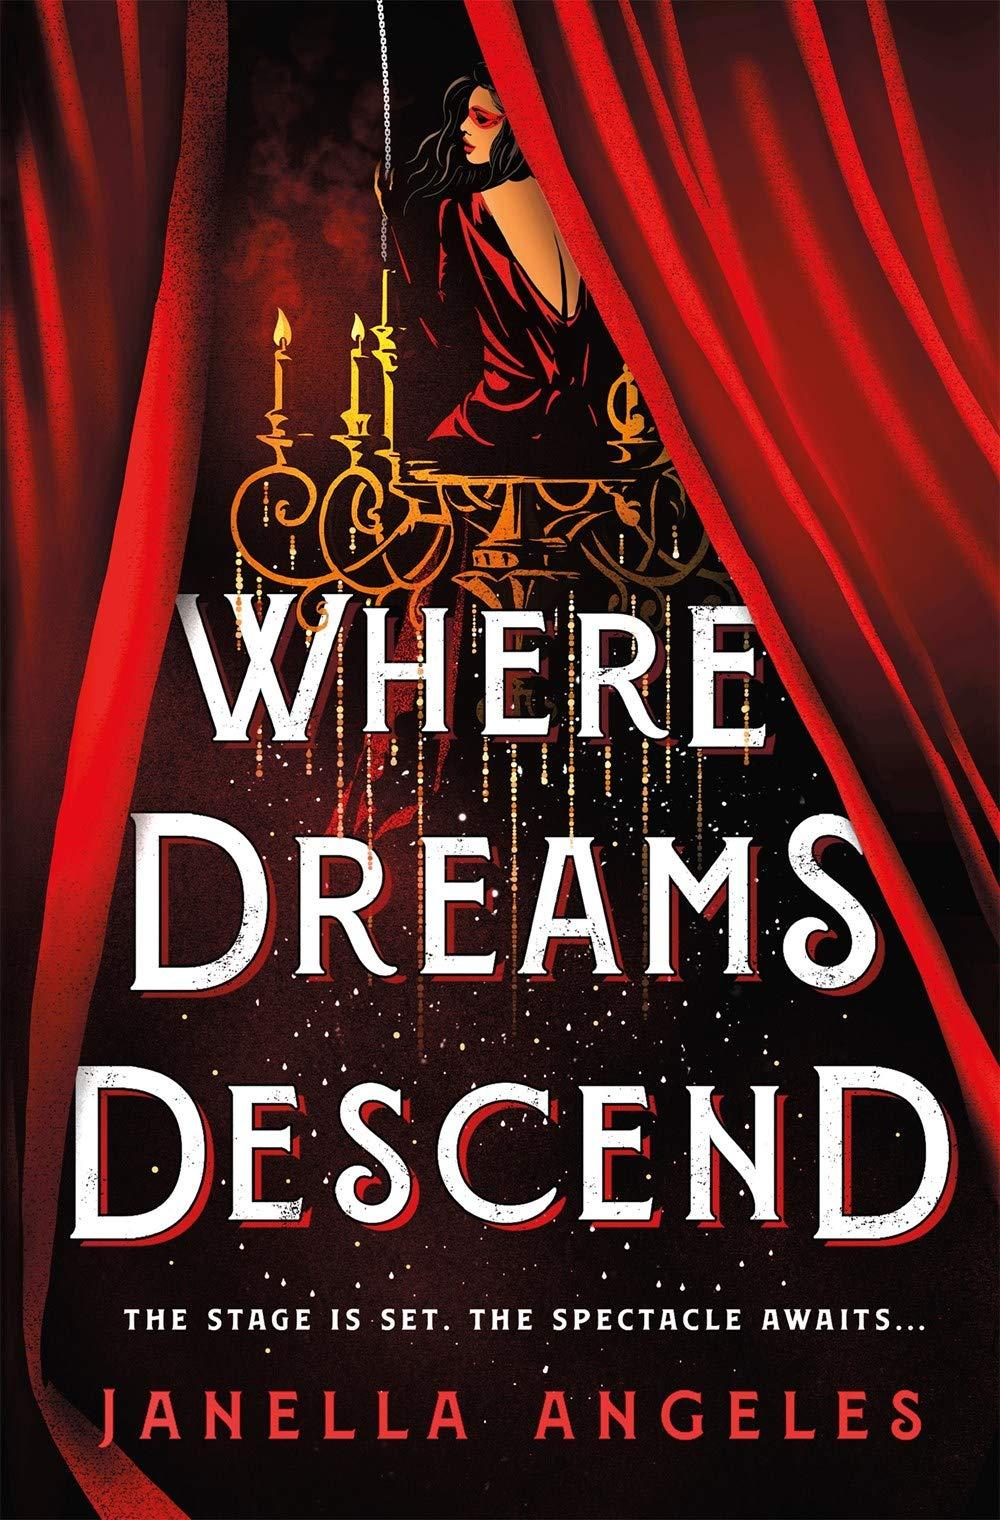 Amazon.com: Where Dreams Descend: A Novel (Kingdom of Cards, 1)  (9781250204356): Angeles, Janella: Books